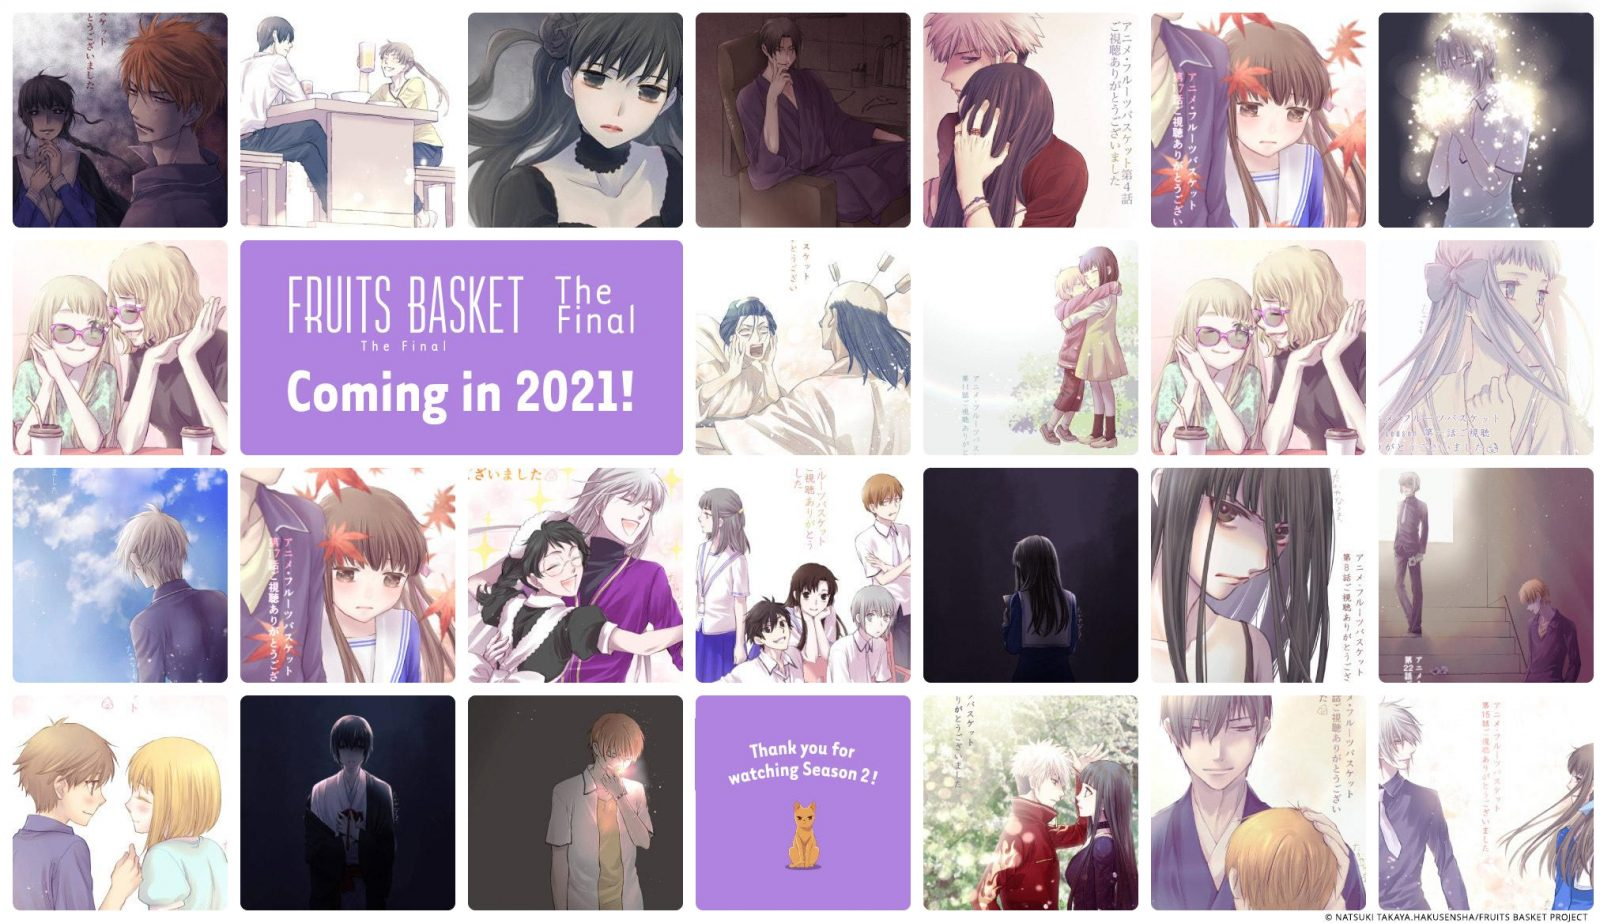 Fruits Basket Season 3 Announcement